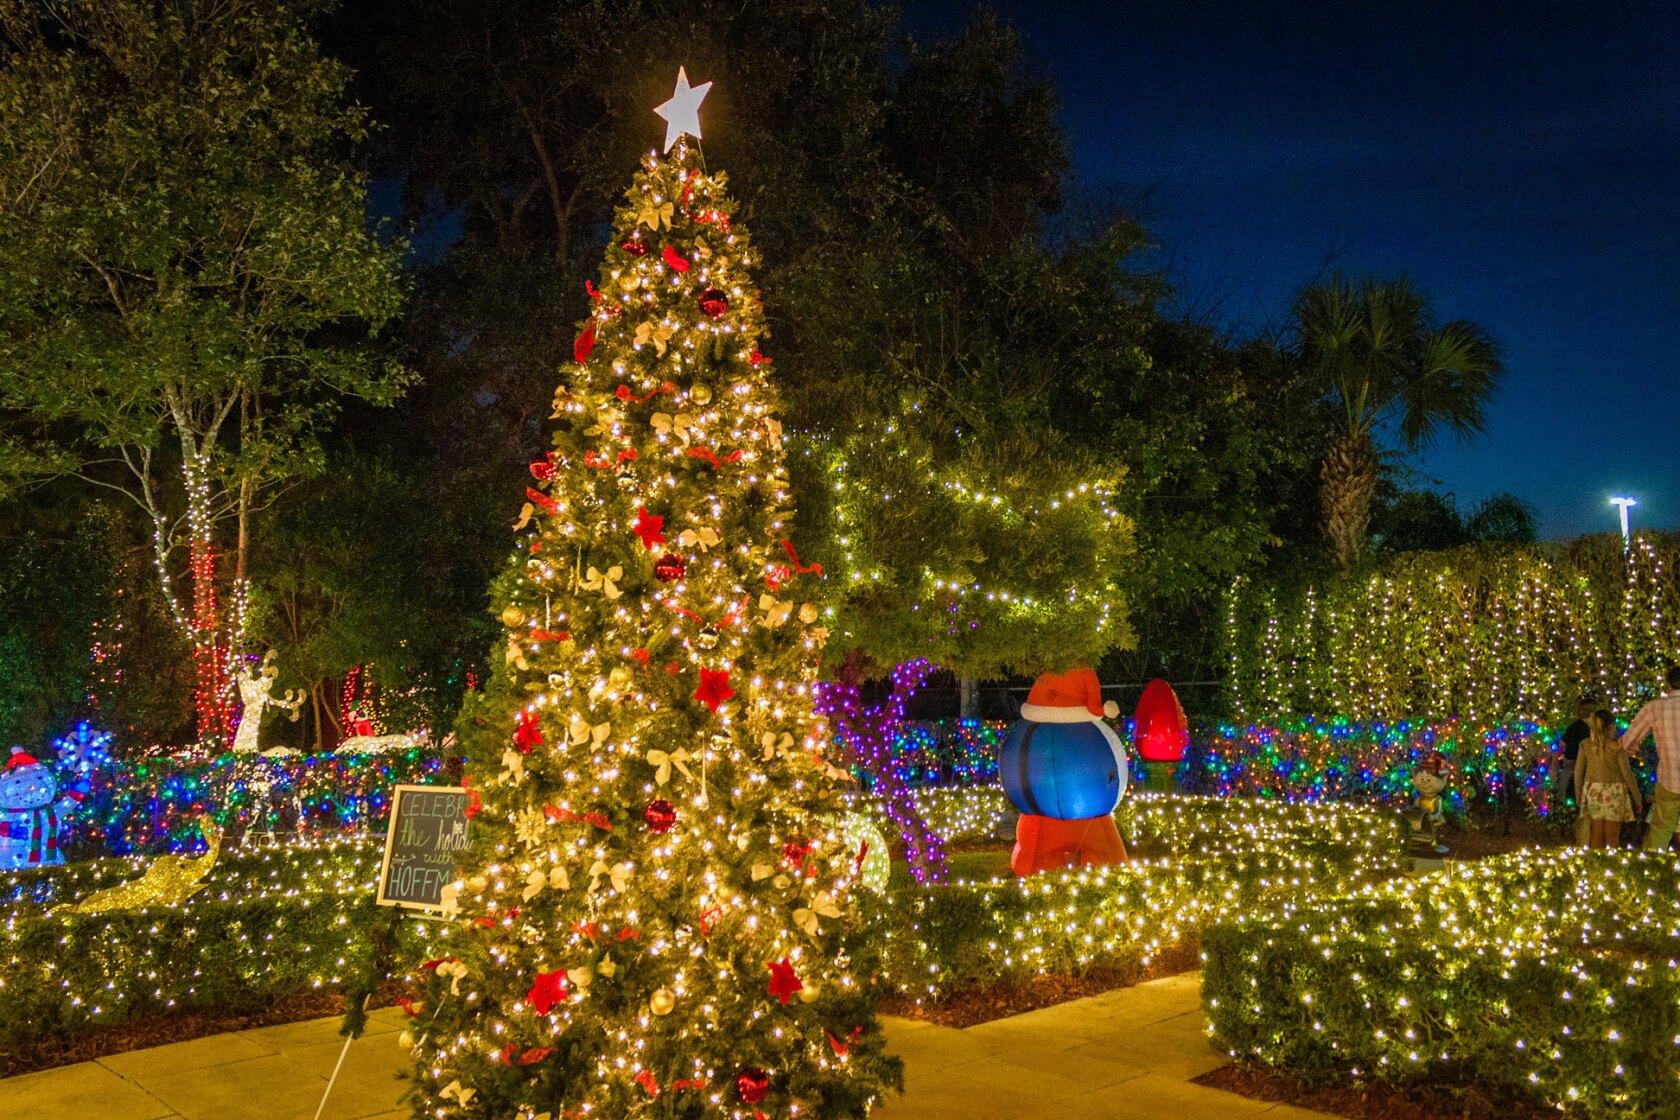 Hoffmans Winter Wonderland 2020.Hoffman S Chocolates Opens Winter Wonderland Los Angeles Times